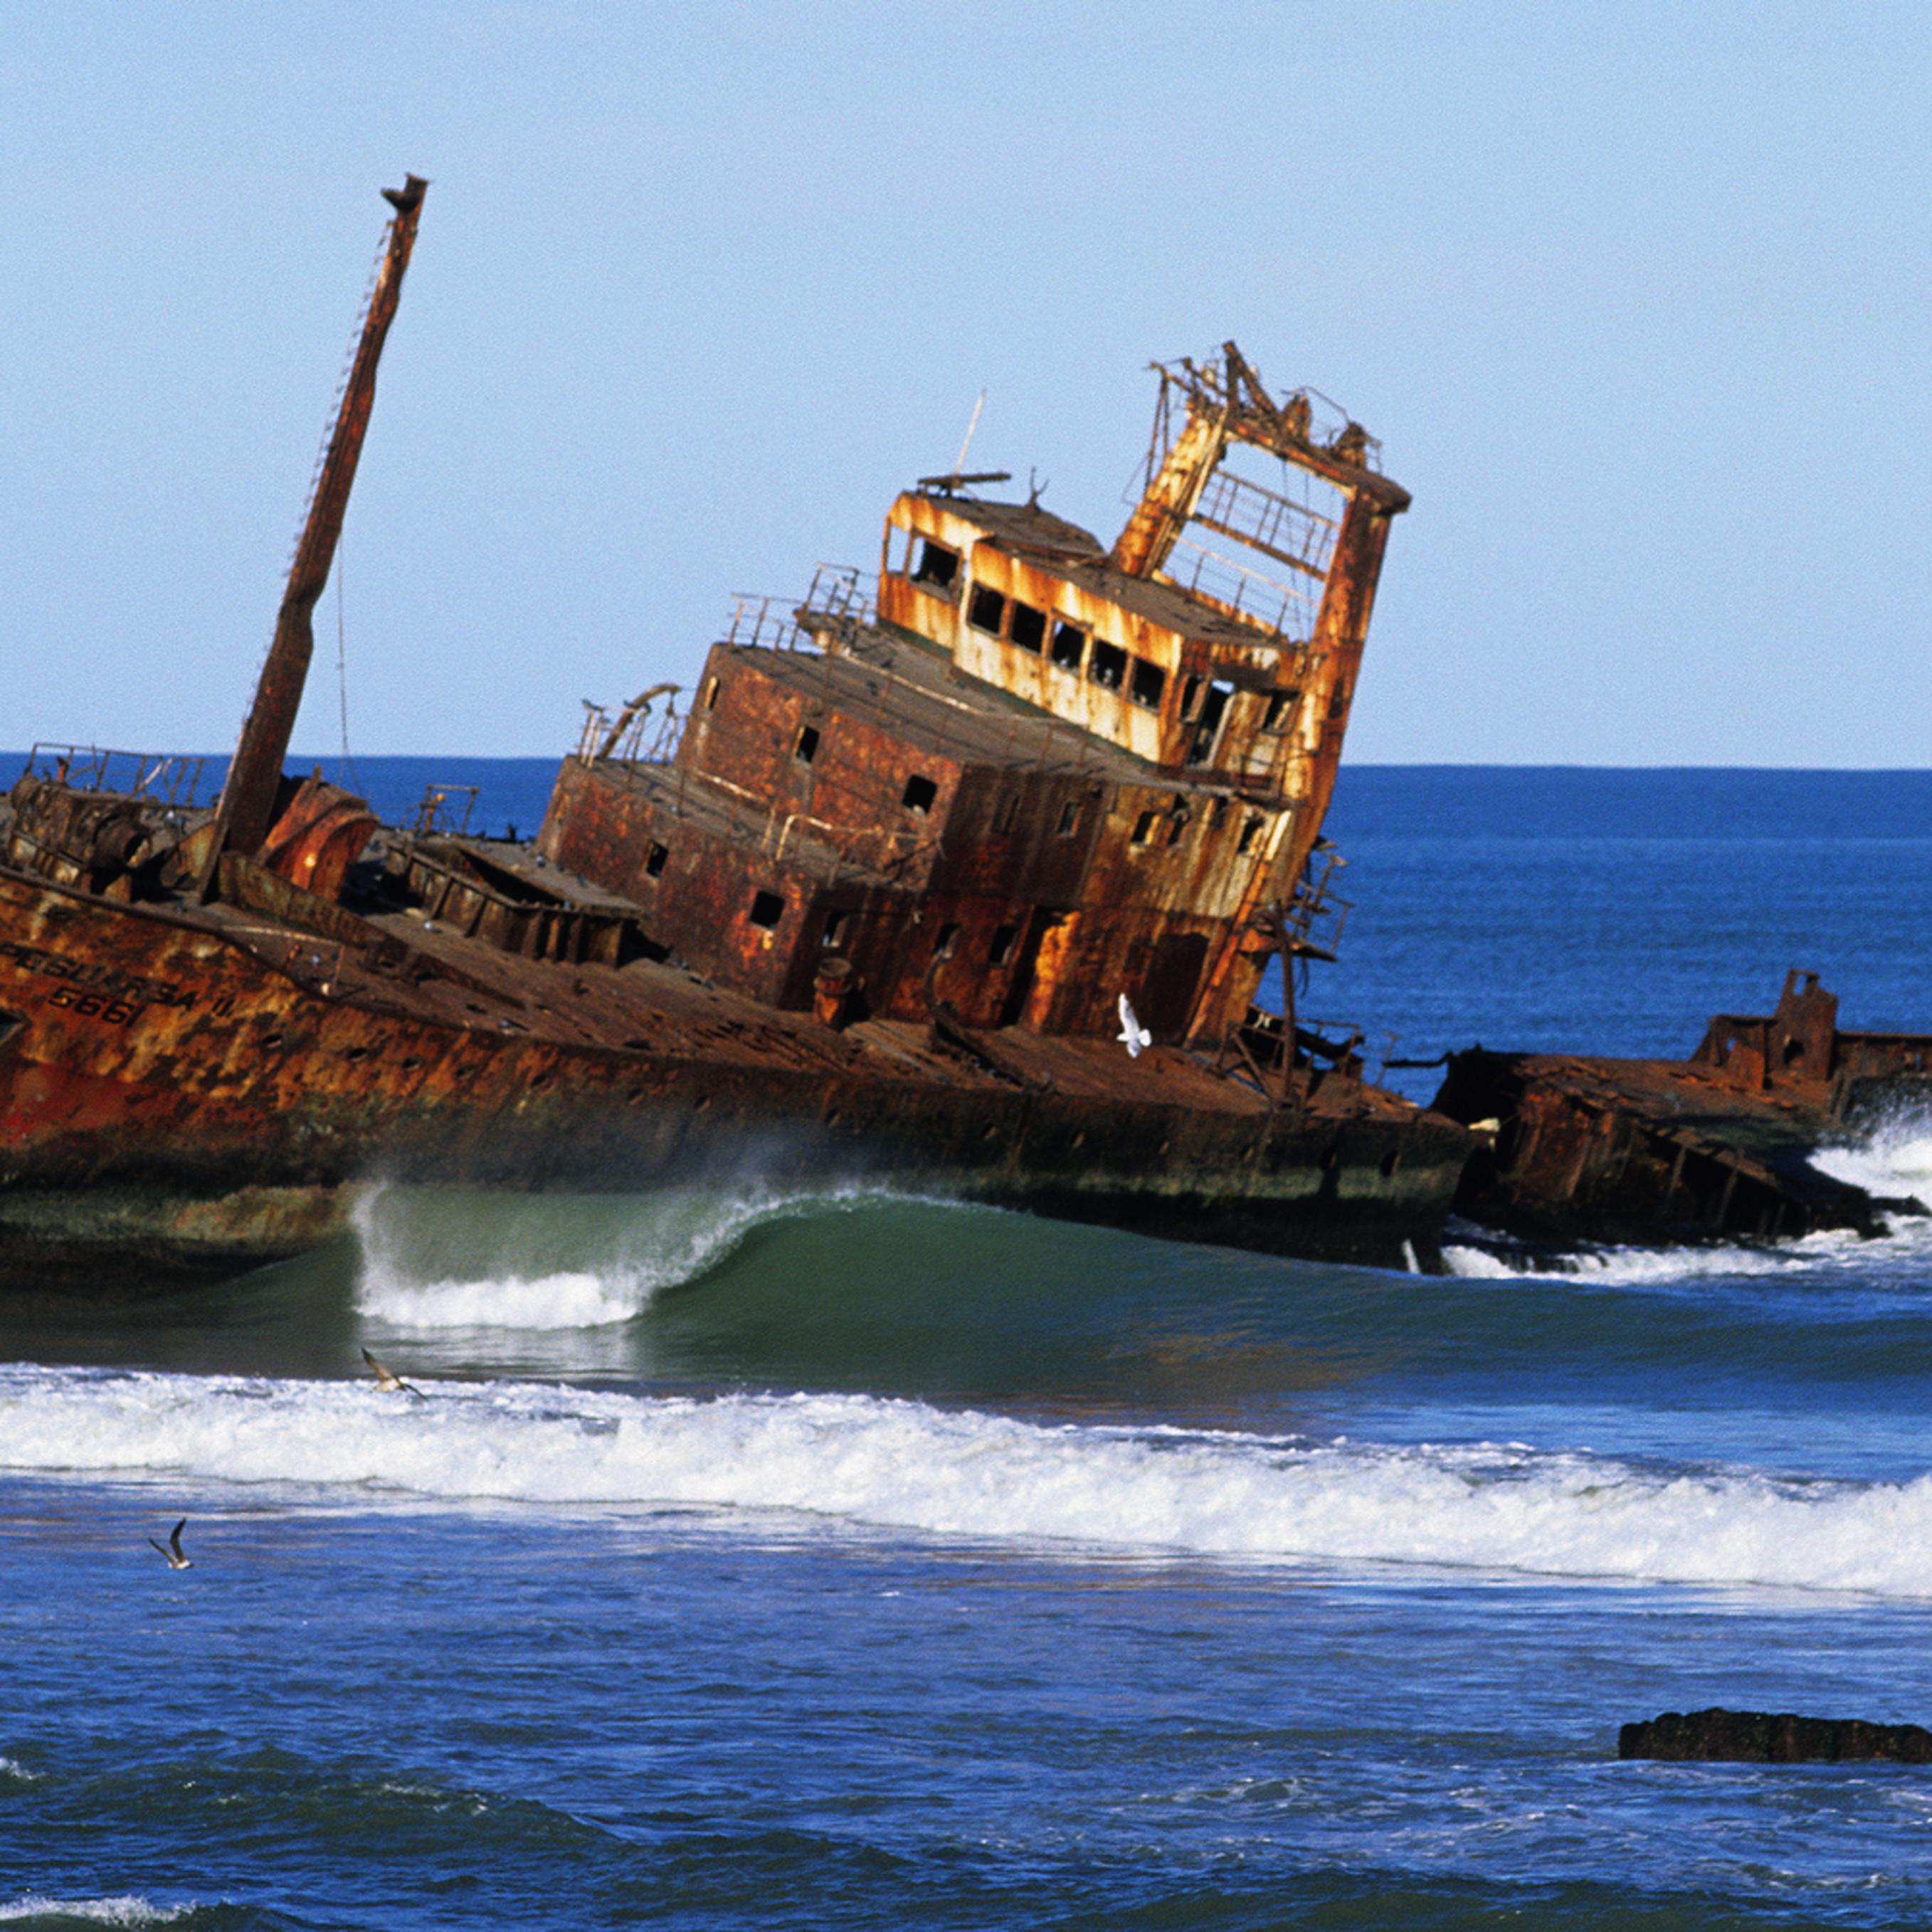 Shipwreck tuikzj